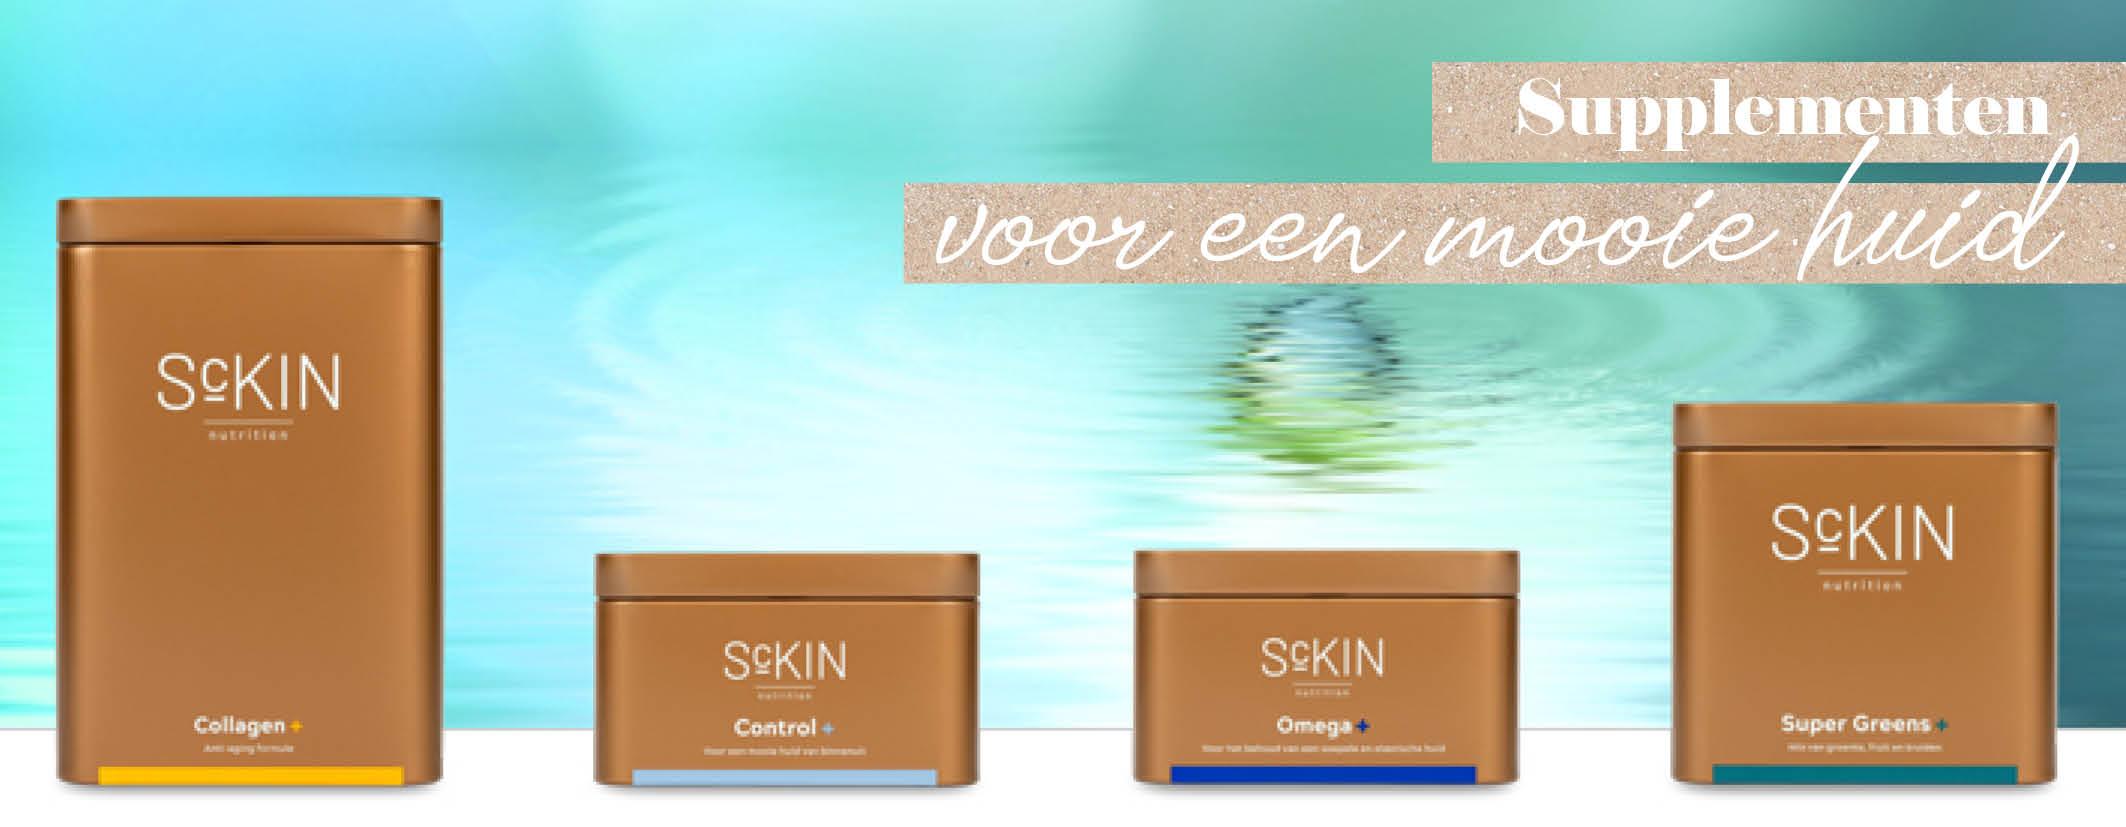 Sckin Nutrition supplementen - Supplementen huid - Skinics -